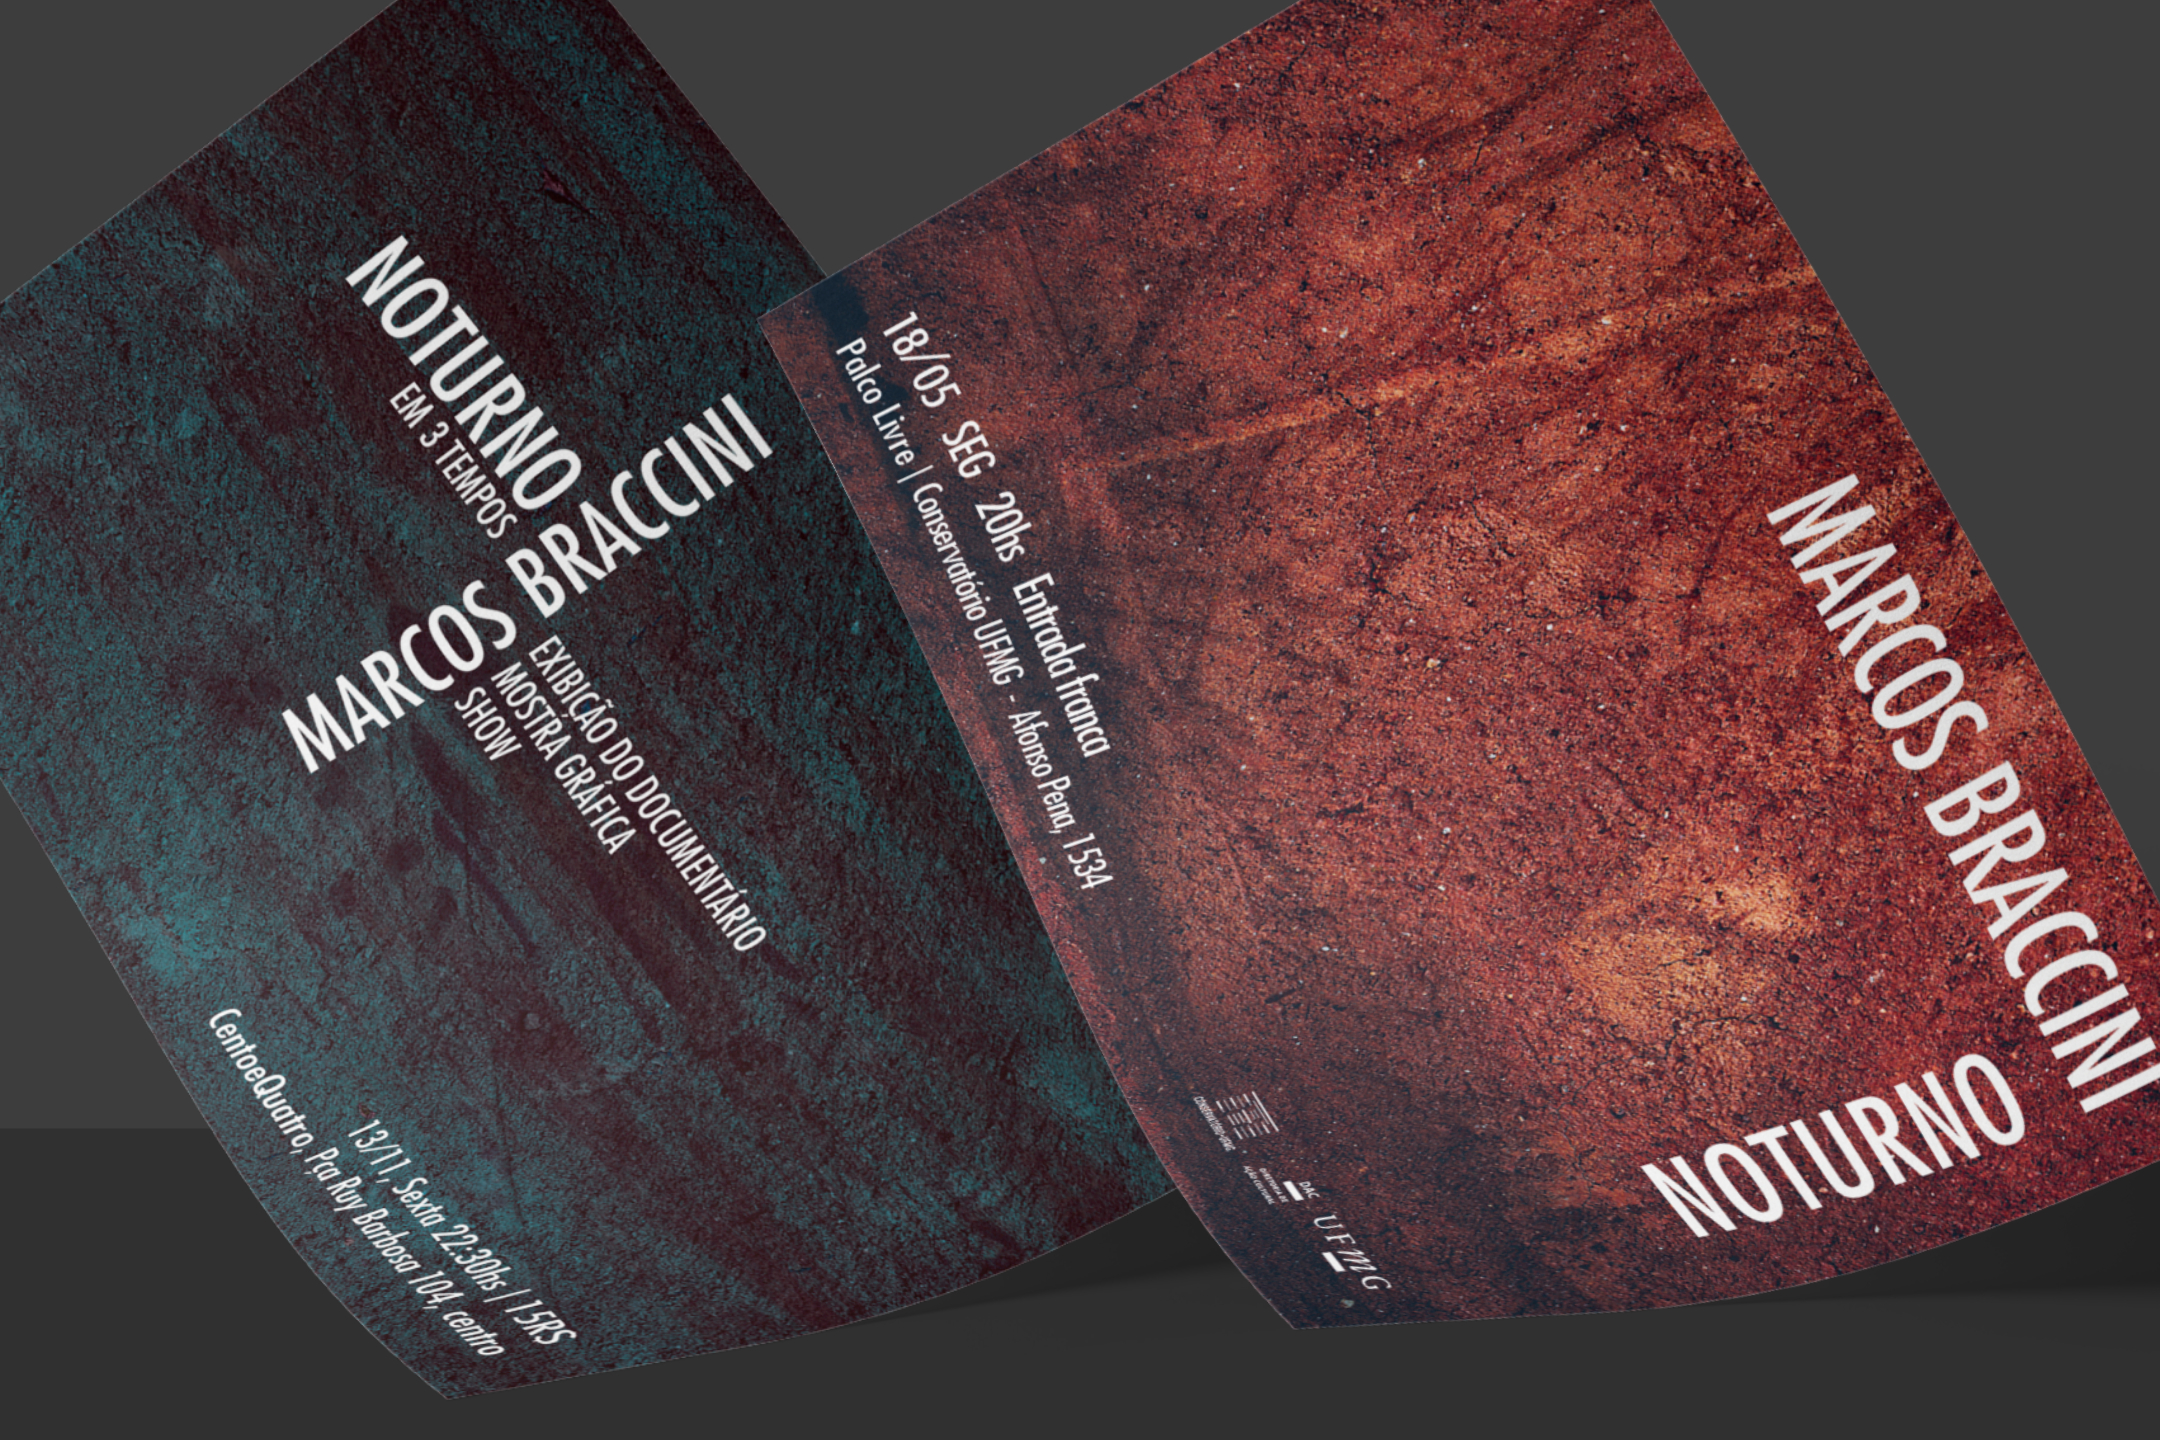 Noturno-Poster-Series-4